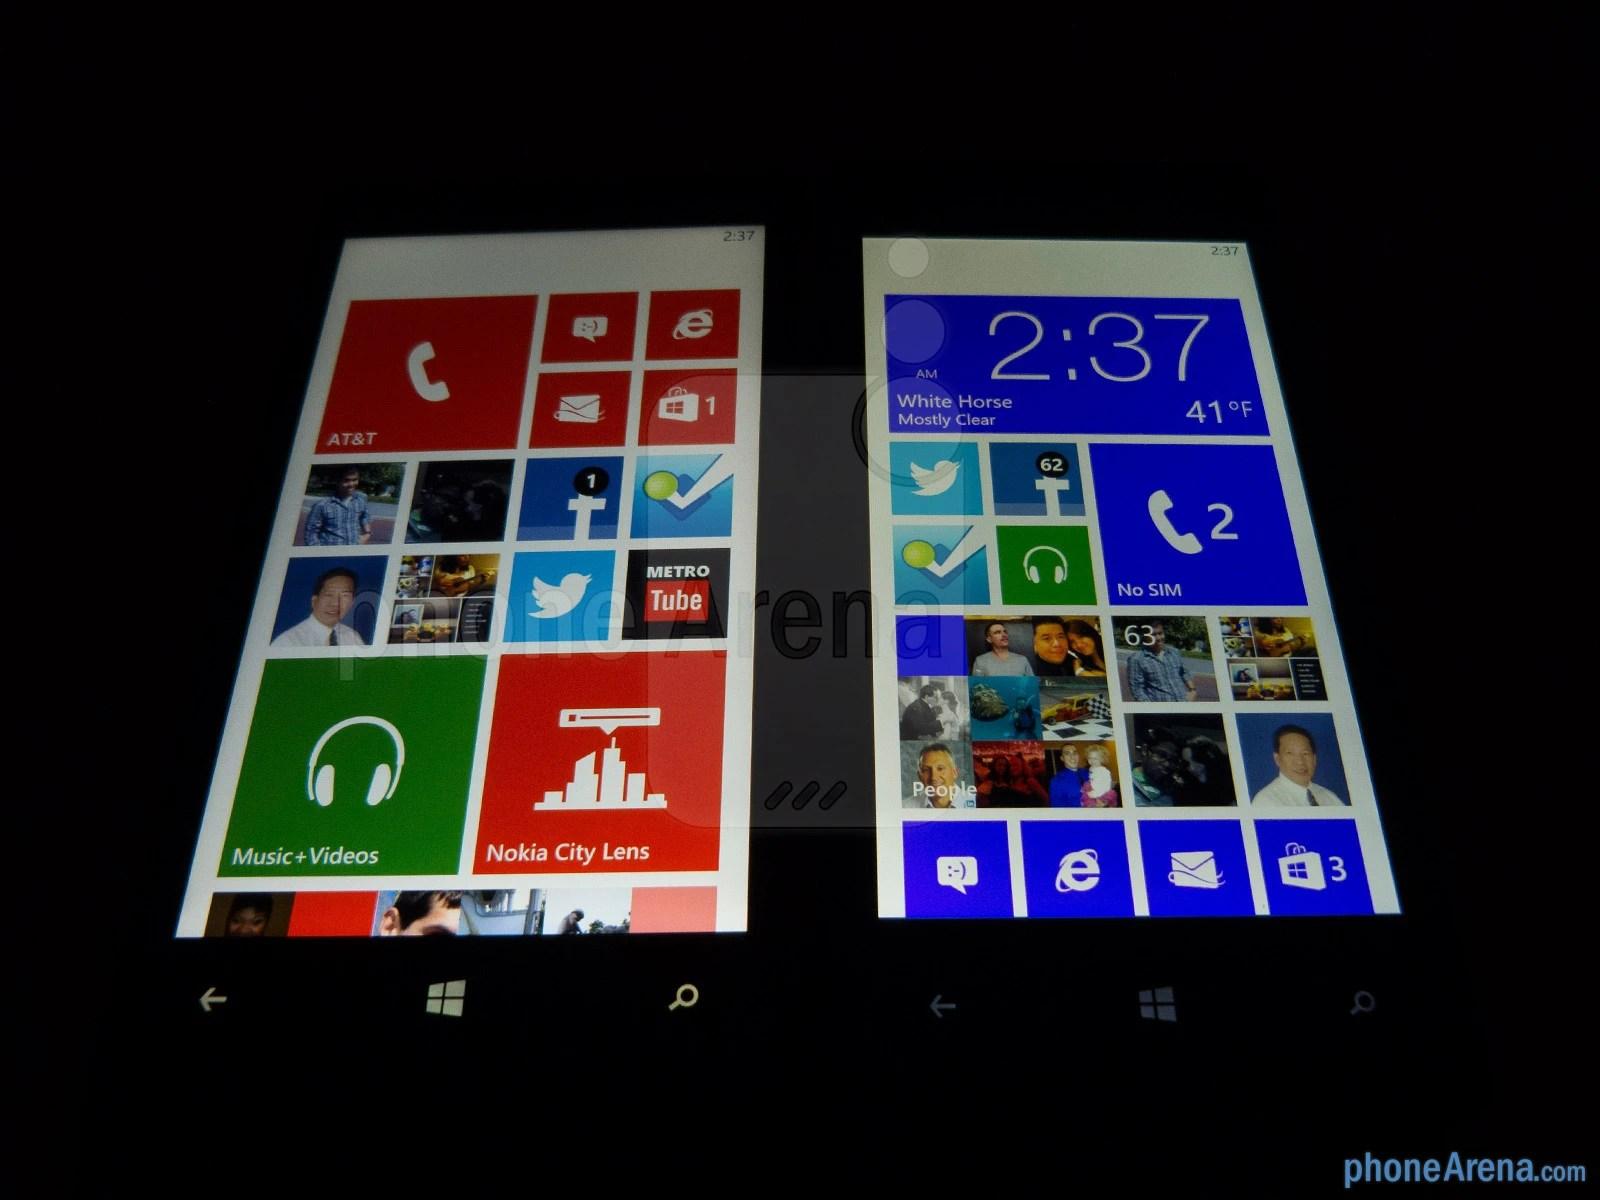 Mobile078 The Greatest Wordpresscom Site In All Land Nokia Lumia 720 Resmi Cyan 11